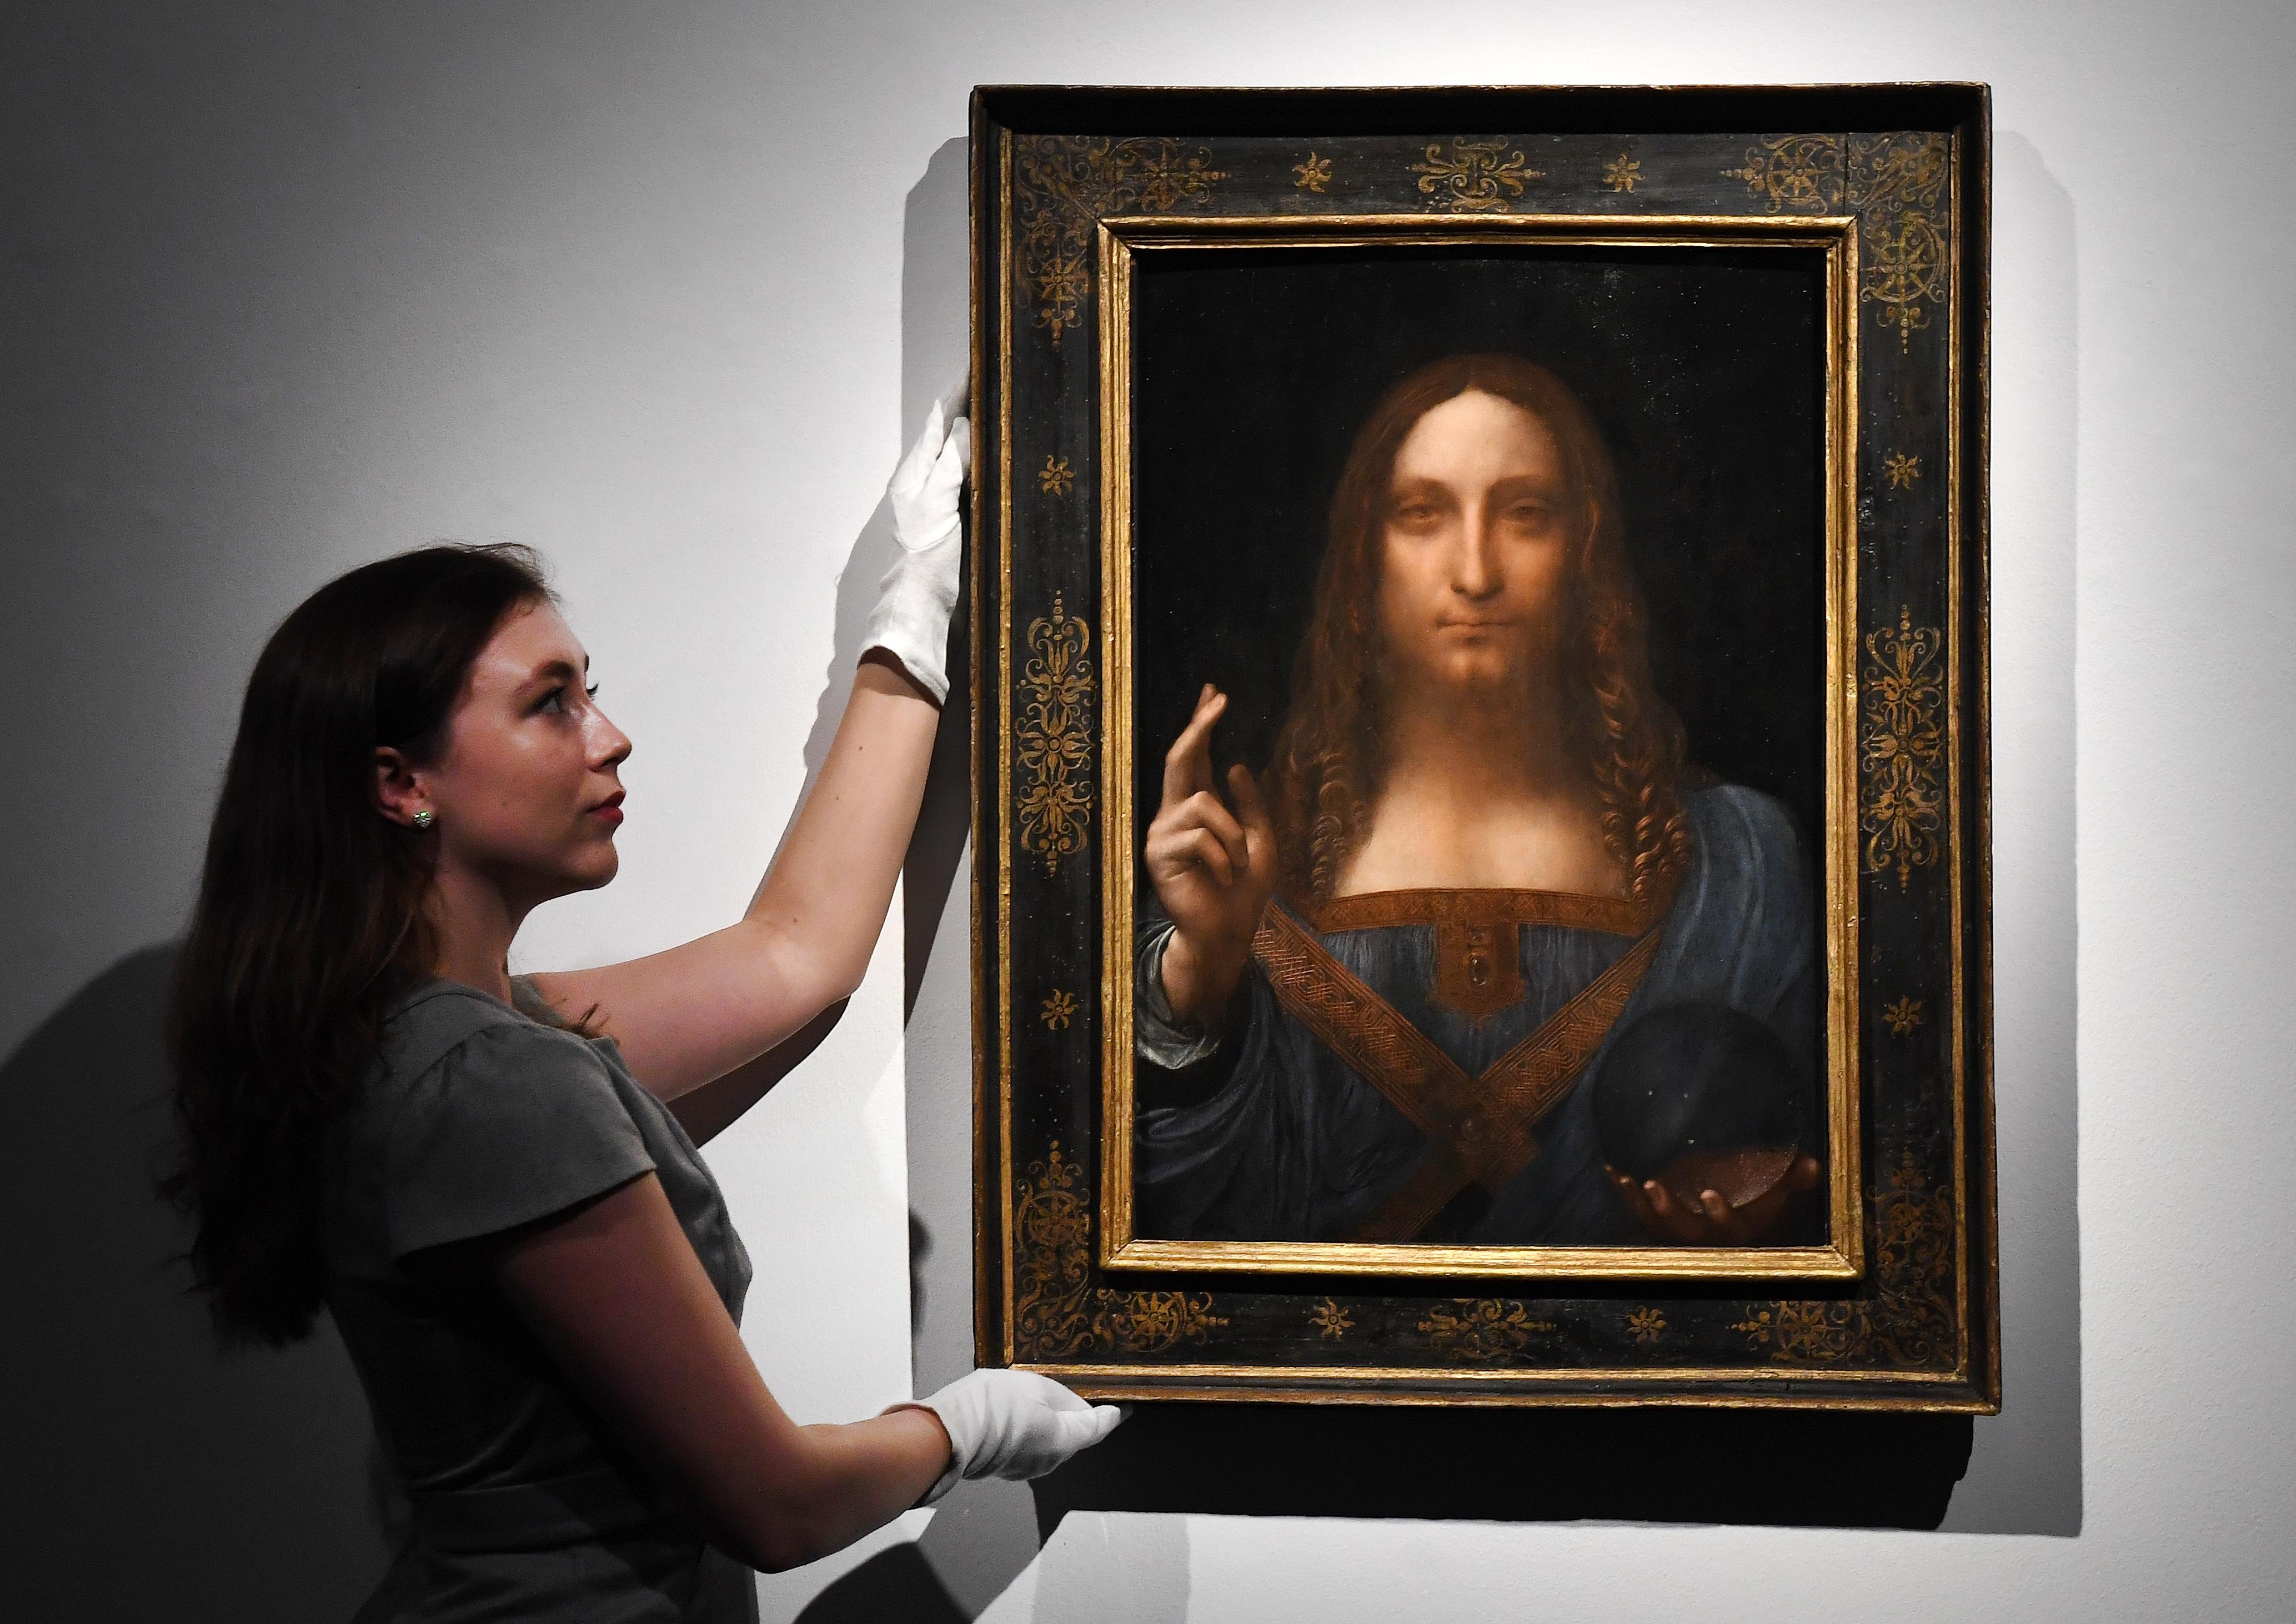 Leonardo da Vinci's painting 'Salvator Mundi' was sold at auction in New York on Nov. 15, 2017.